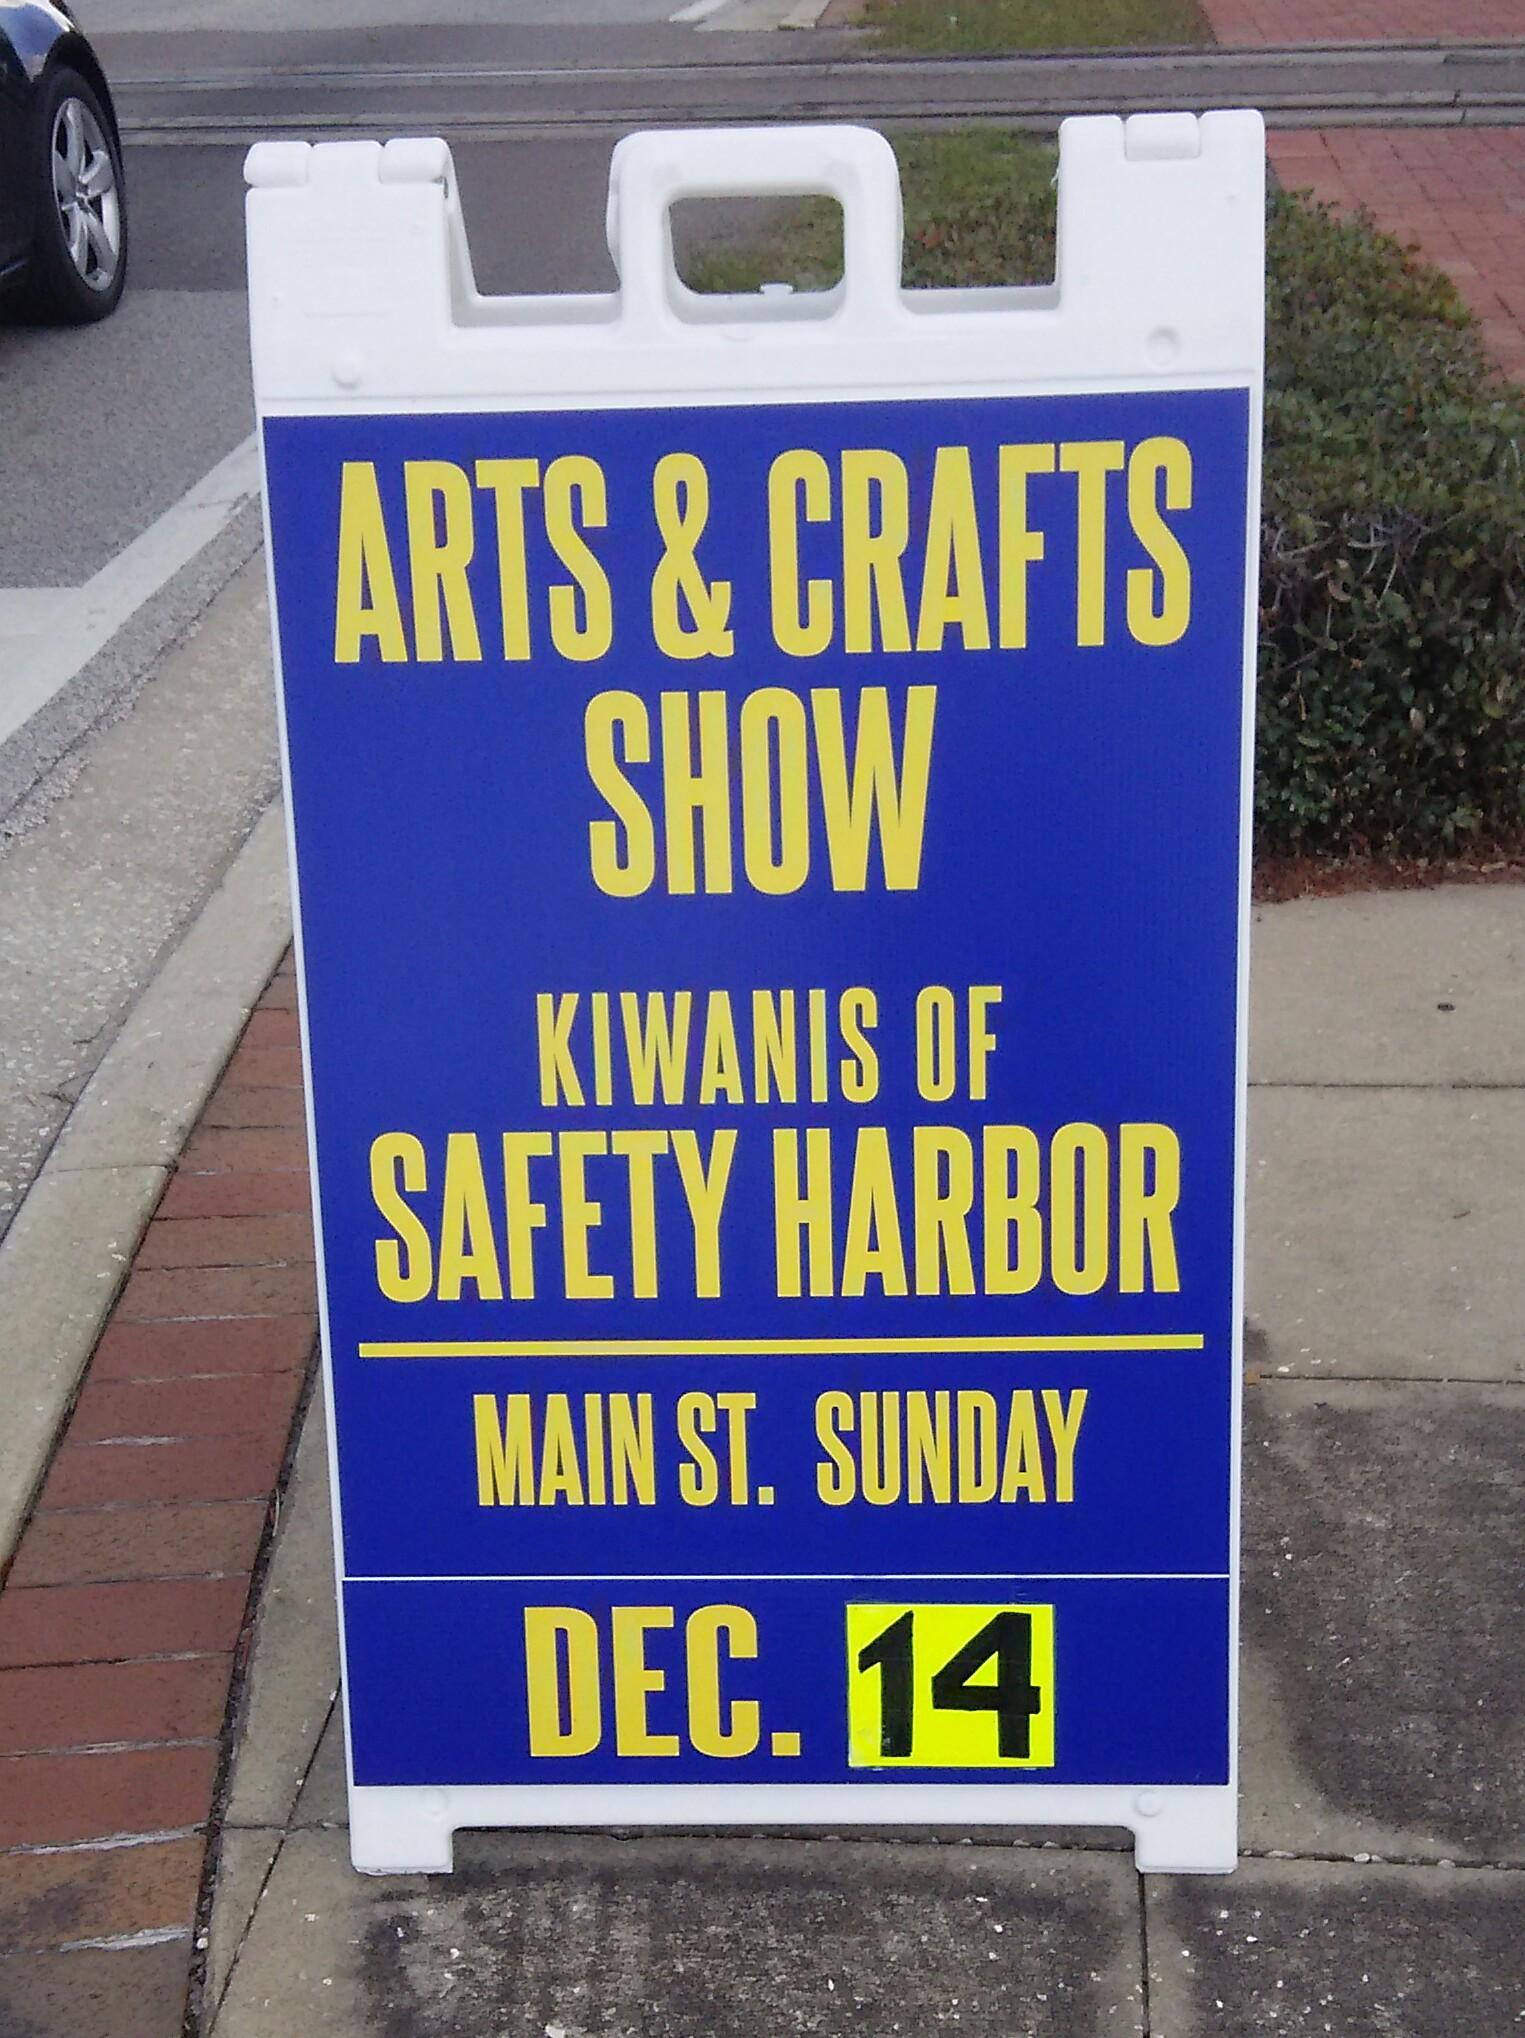 Kiwanis Safety Harbor Craft Show